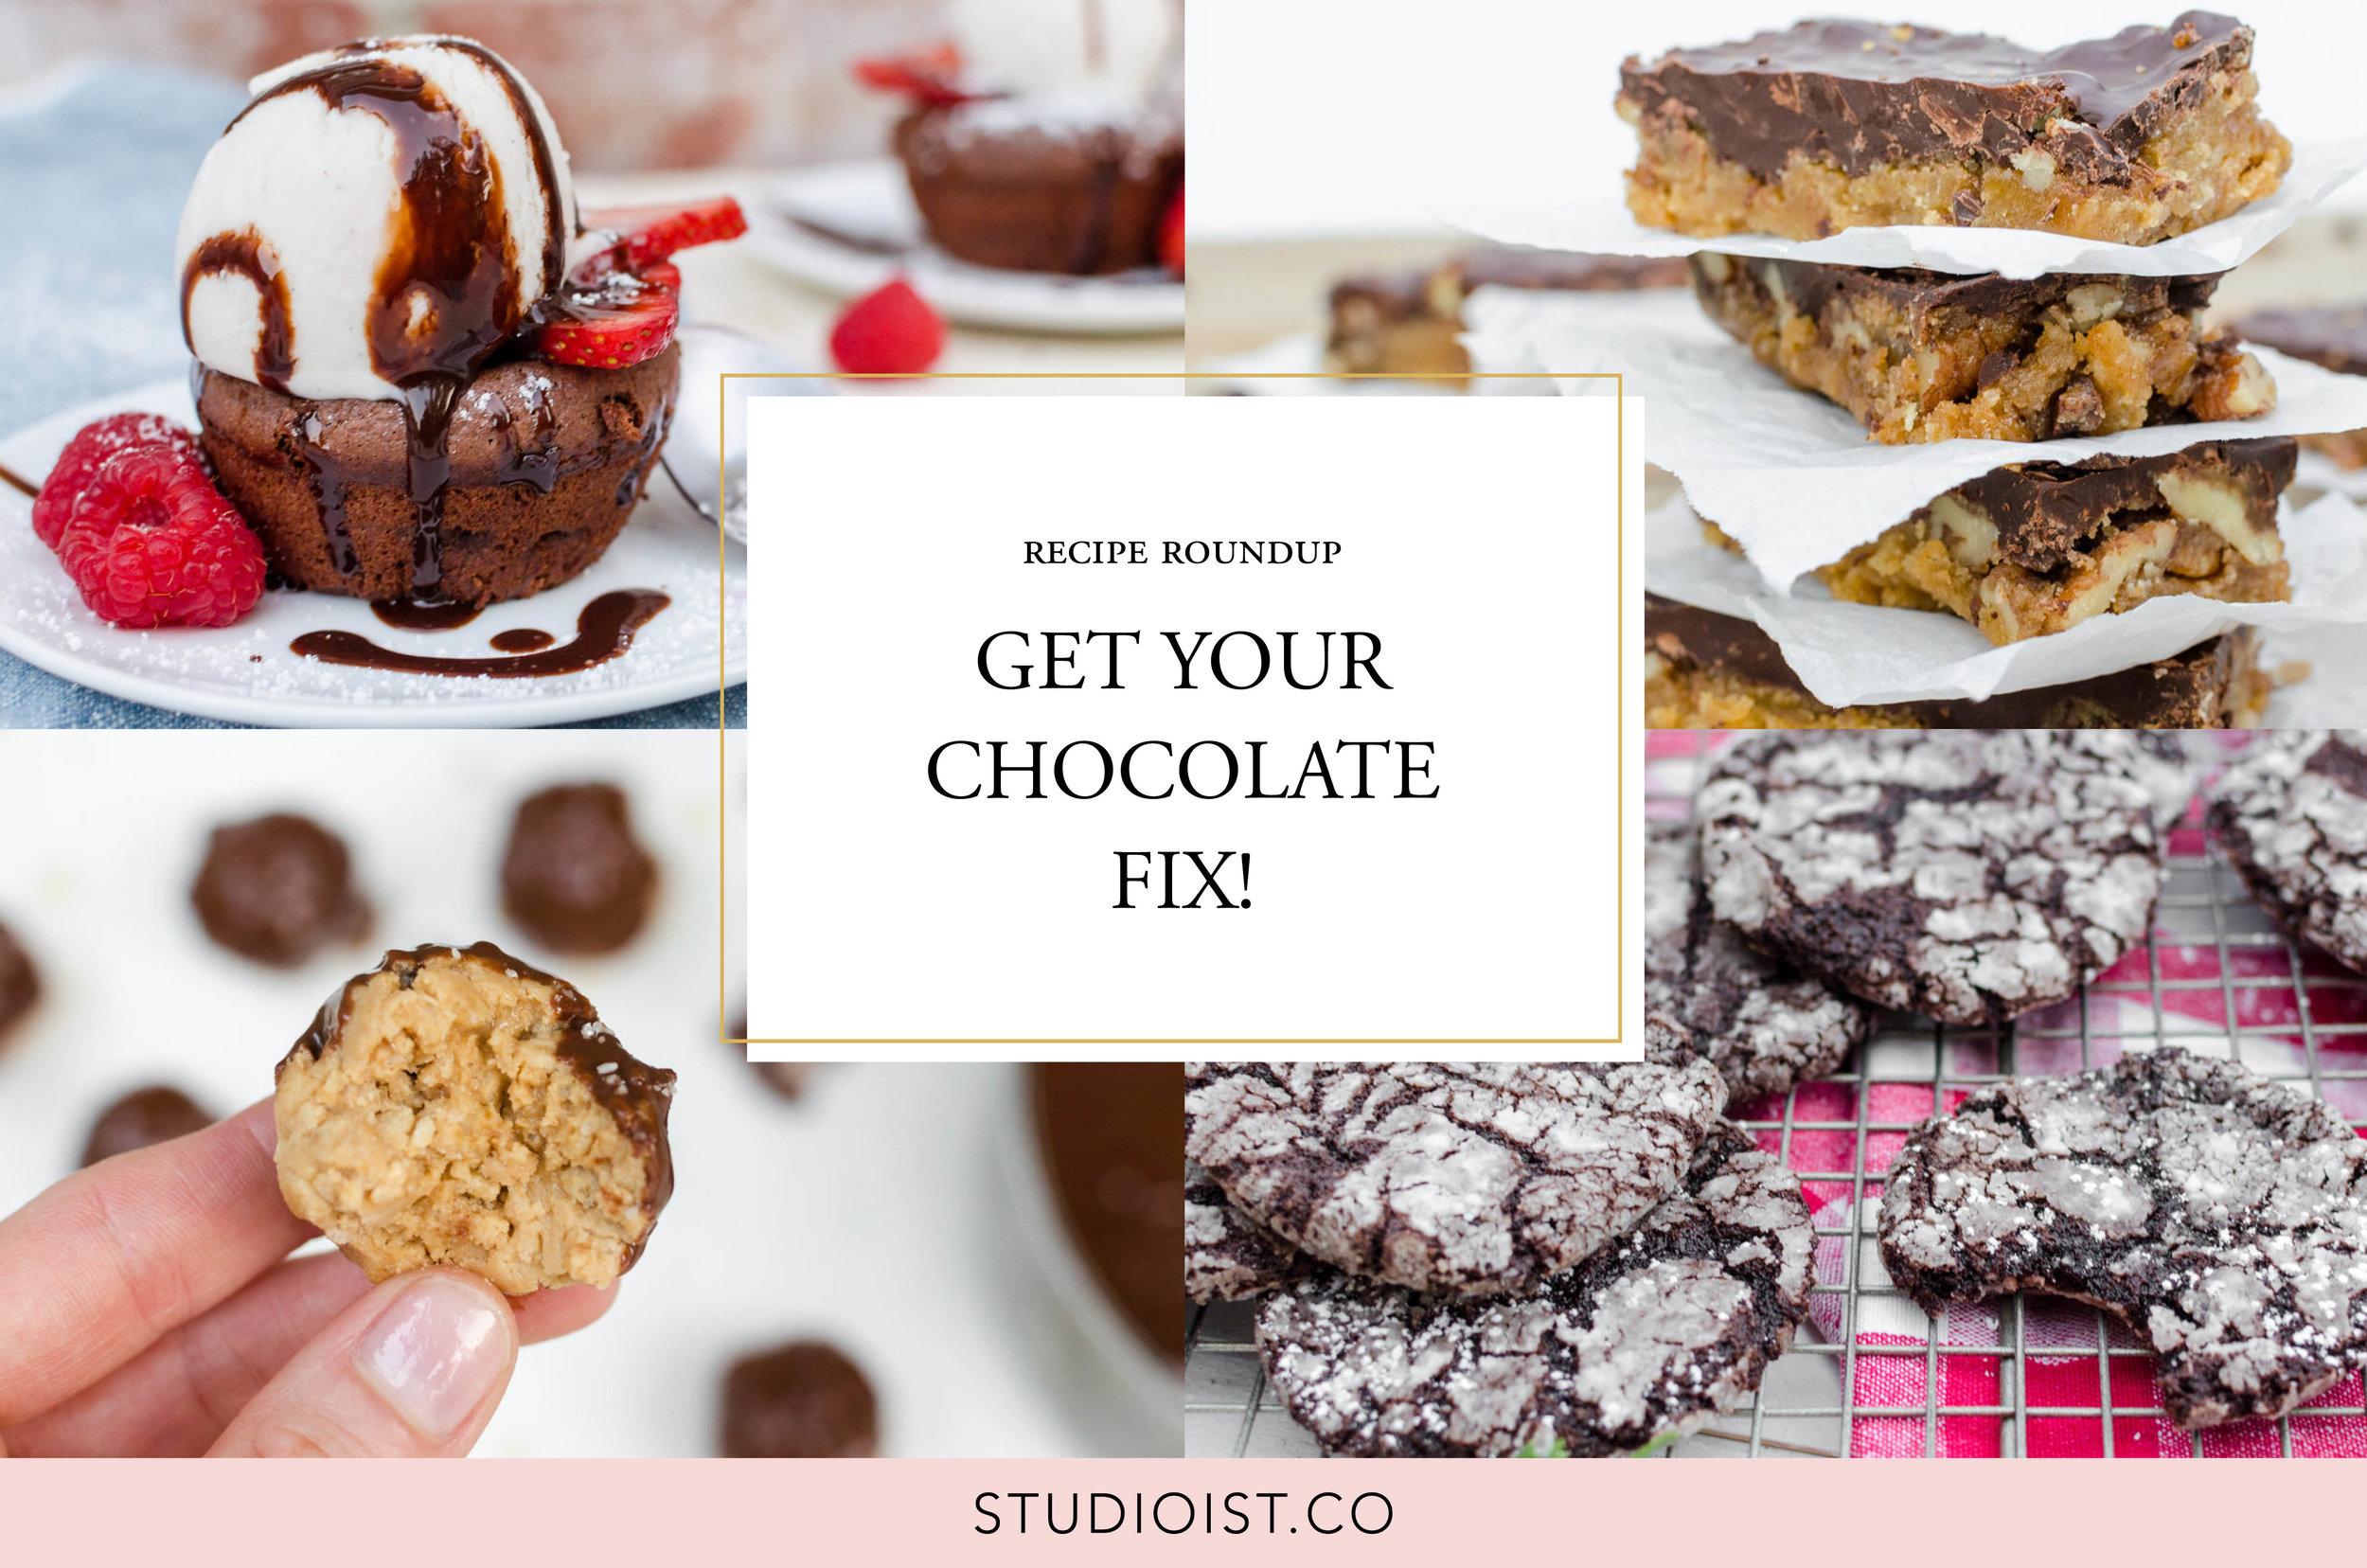 Studioist_Food Cover Photos_Chocolate Recipes 2018.jpg